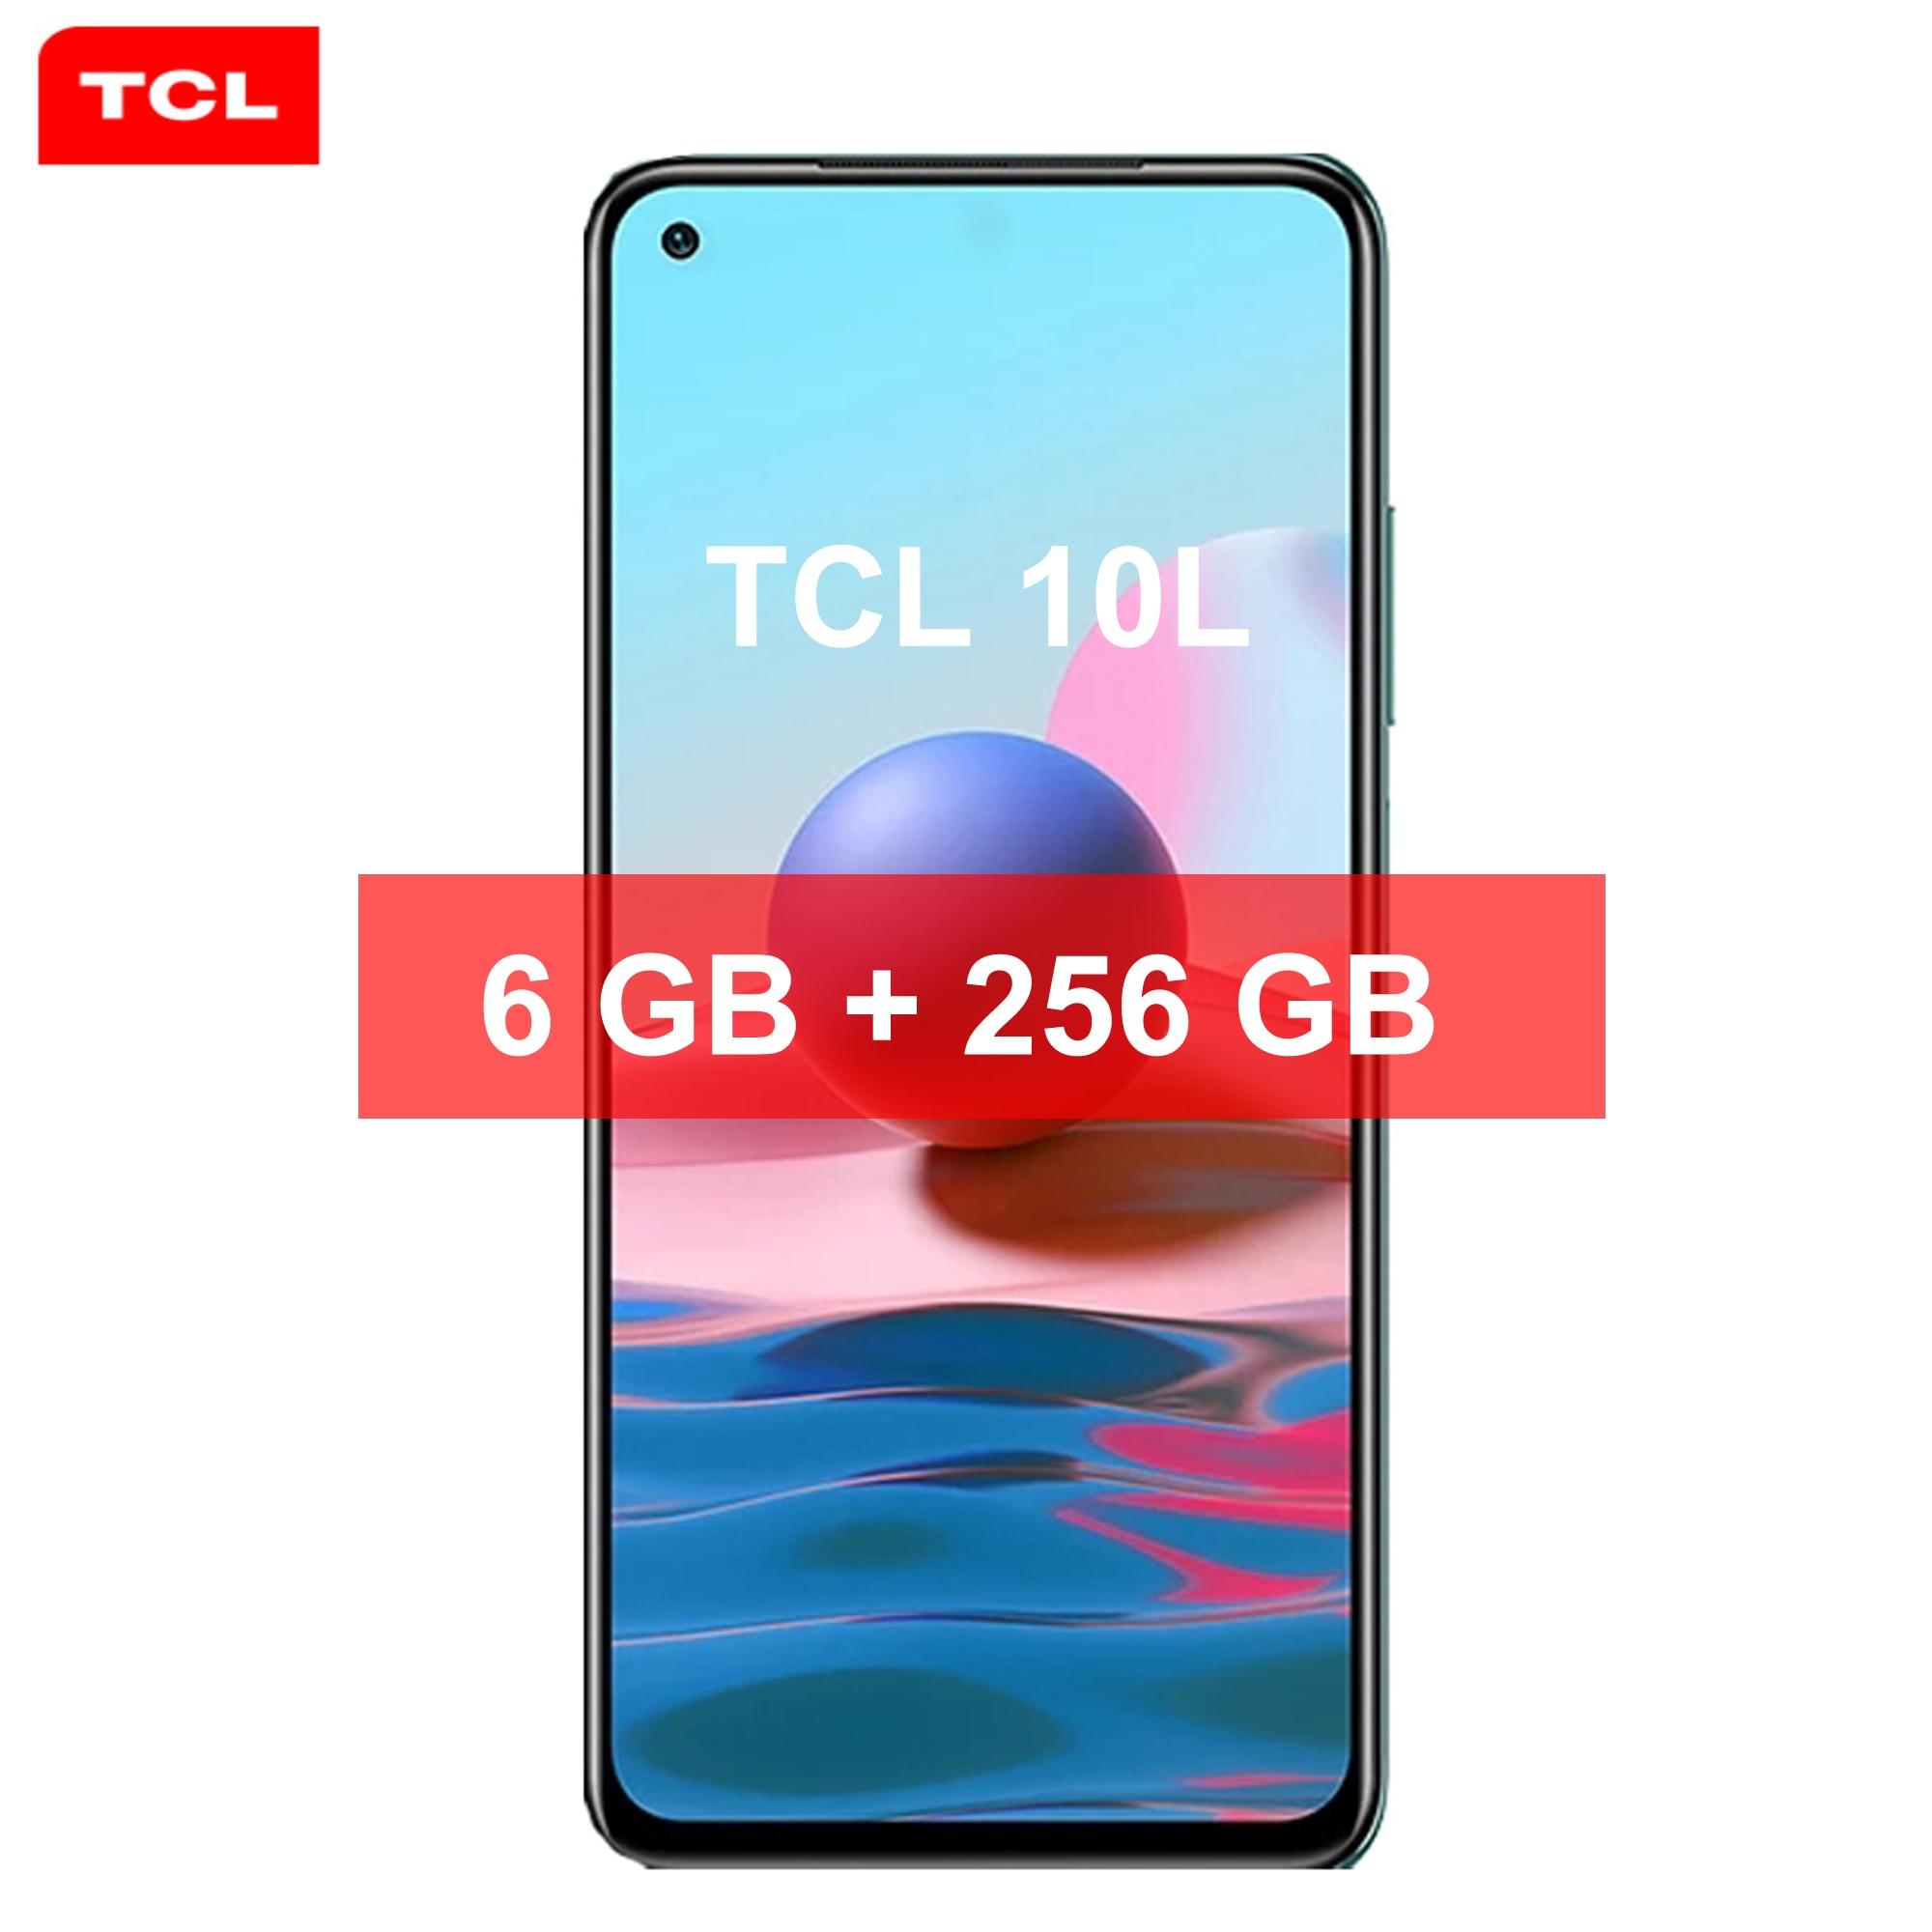 الهاتف الذكي TCL 10L رباعي الكاميرا NFC 6GB + 256GB 6.53